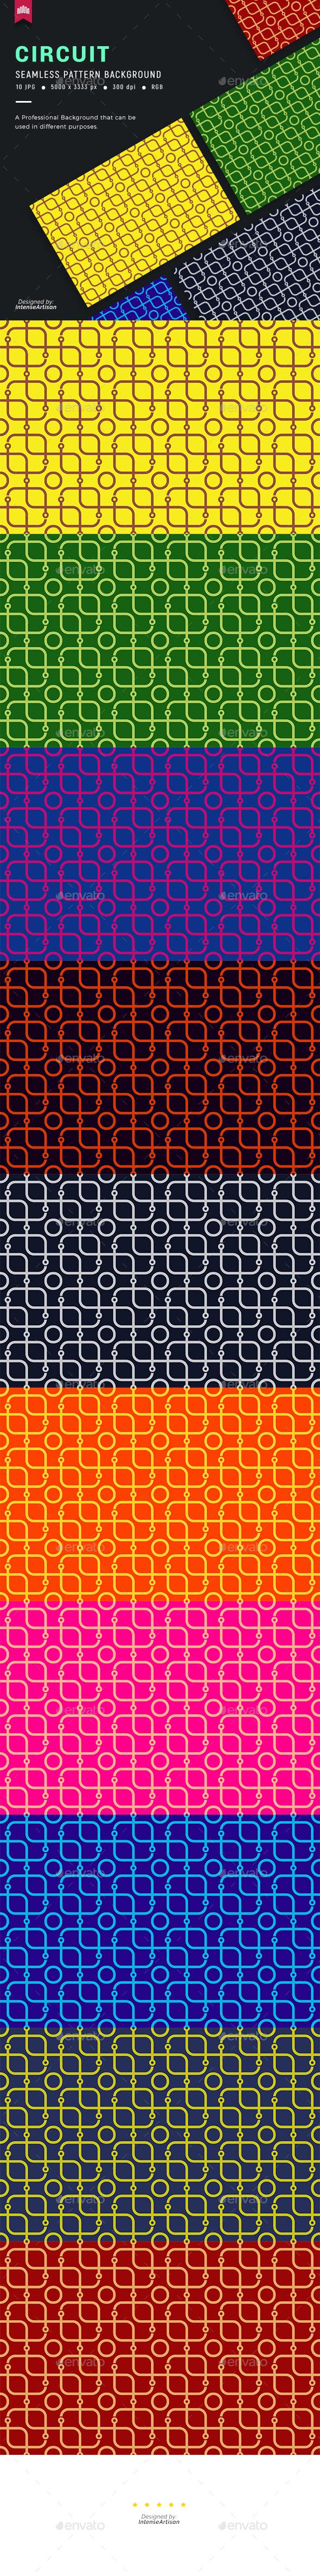 Circuit Seamless Pattern Background - Patterns Backgrounds